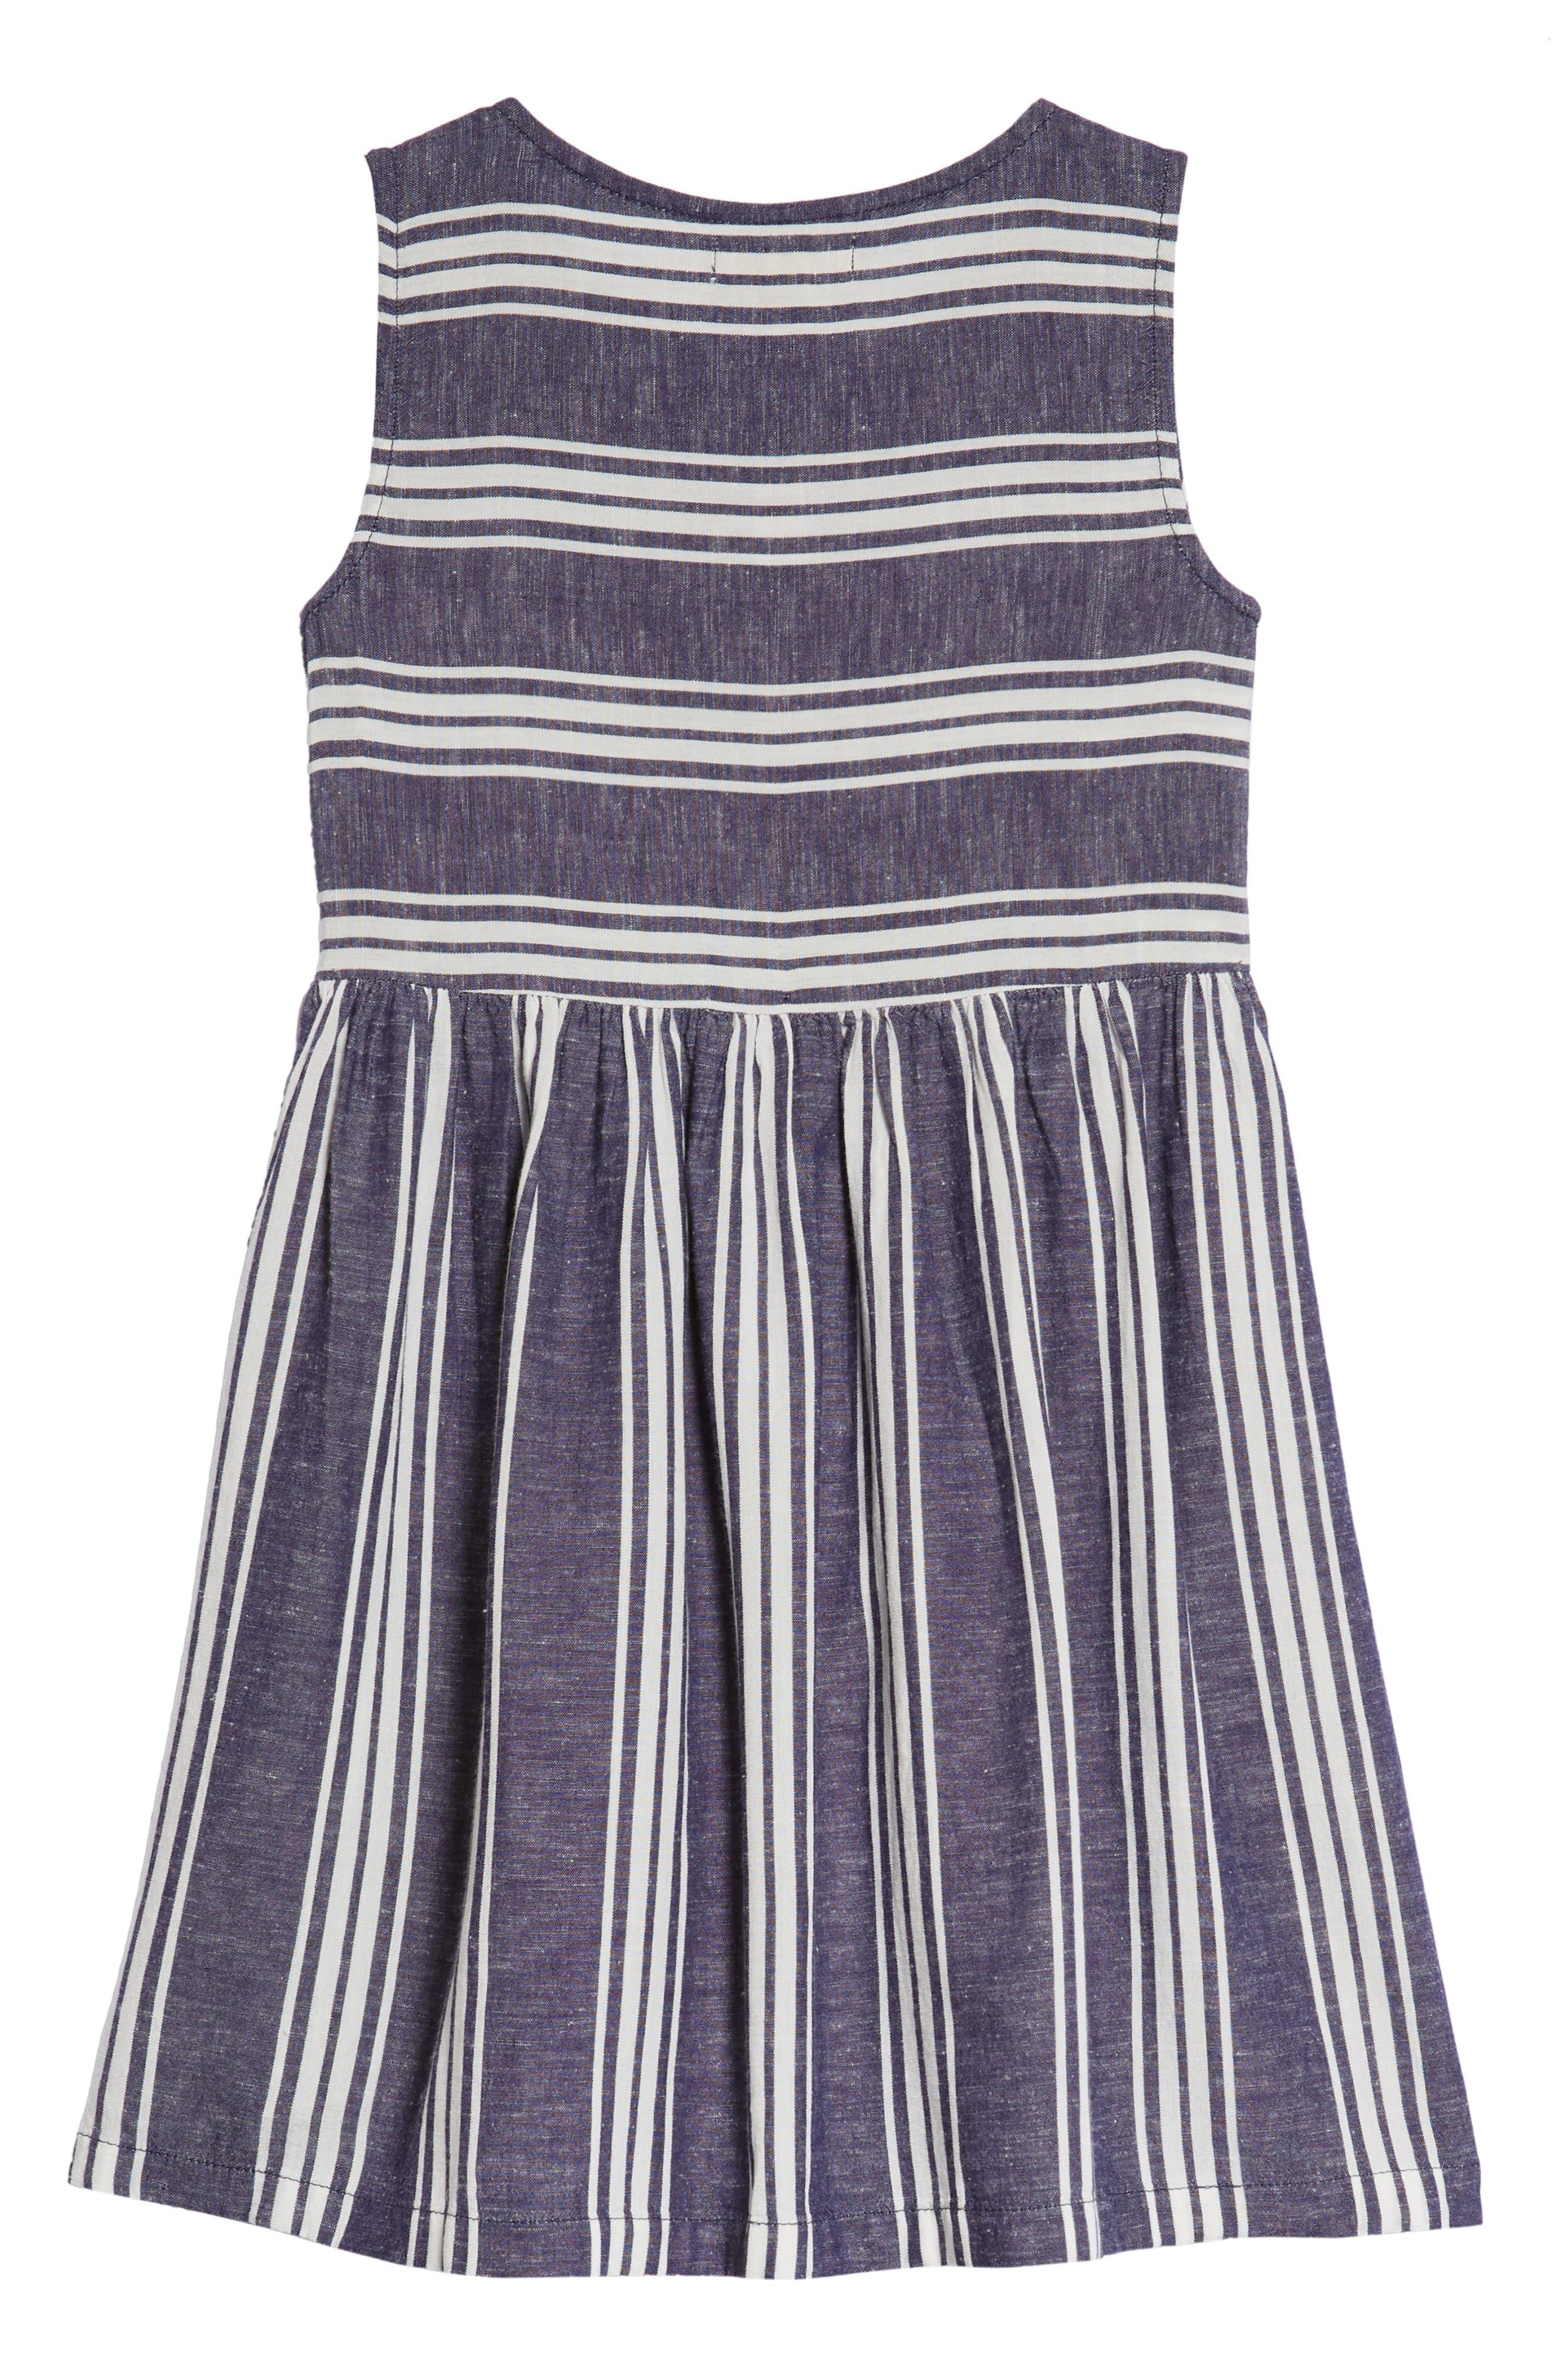 Alternate Image 2  - Tucker + Tate Stripe Fit & Flare Dress (Toddler Girls, Little Girls & Big Girls)